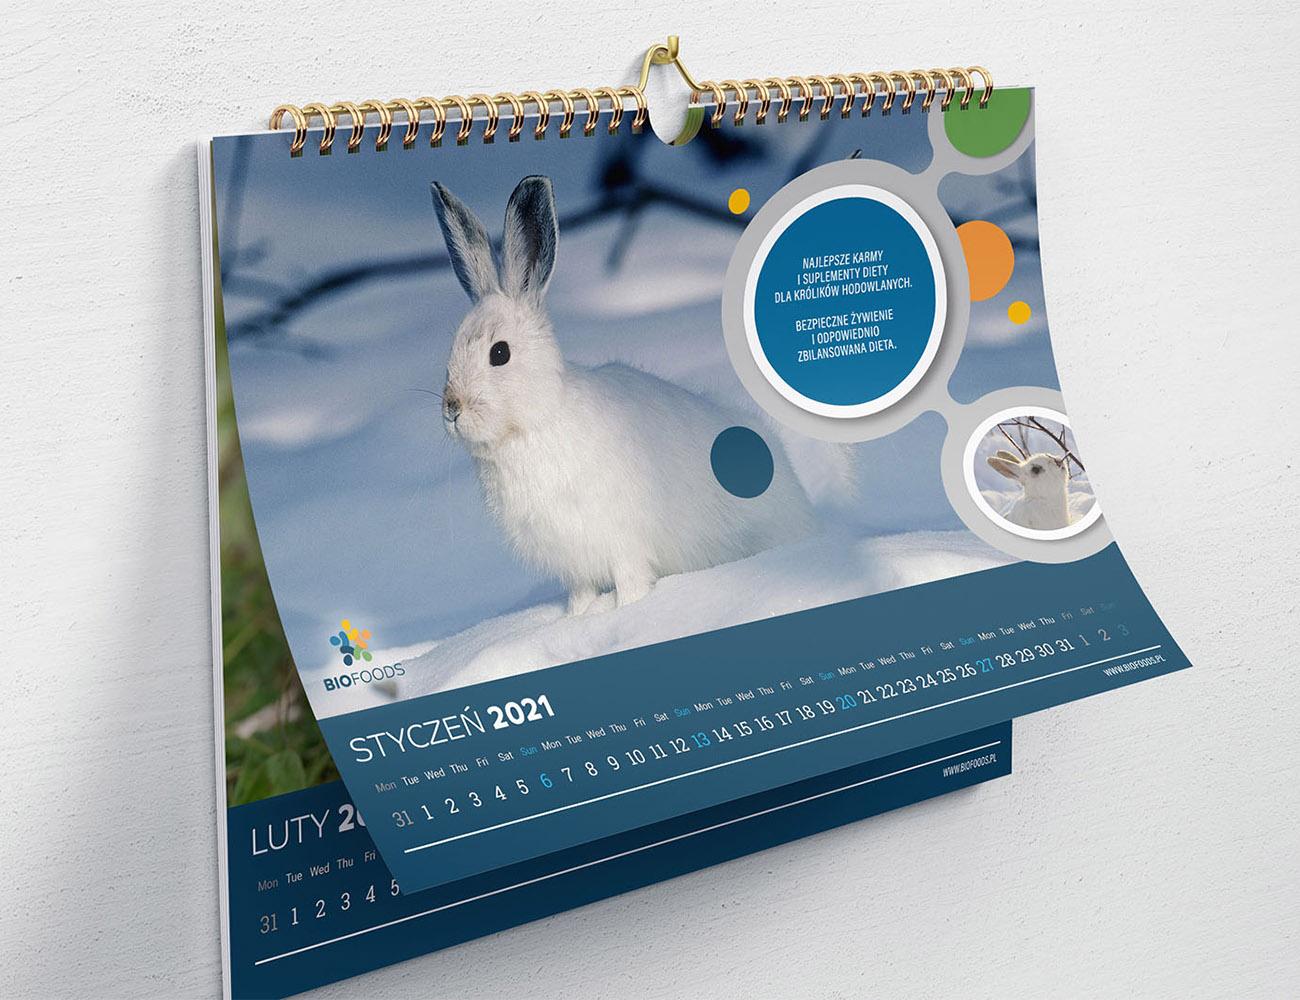 kalendarze scienne dobra drukarnia, kalendarze personalizowane, kalendarze wrocław